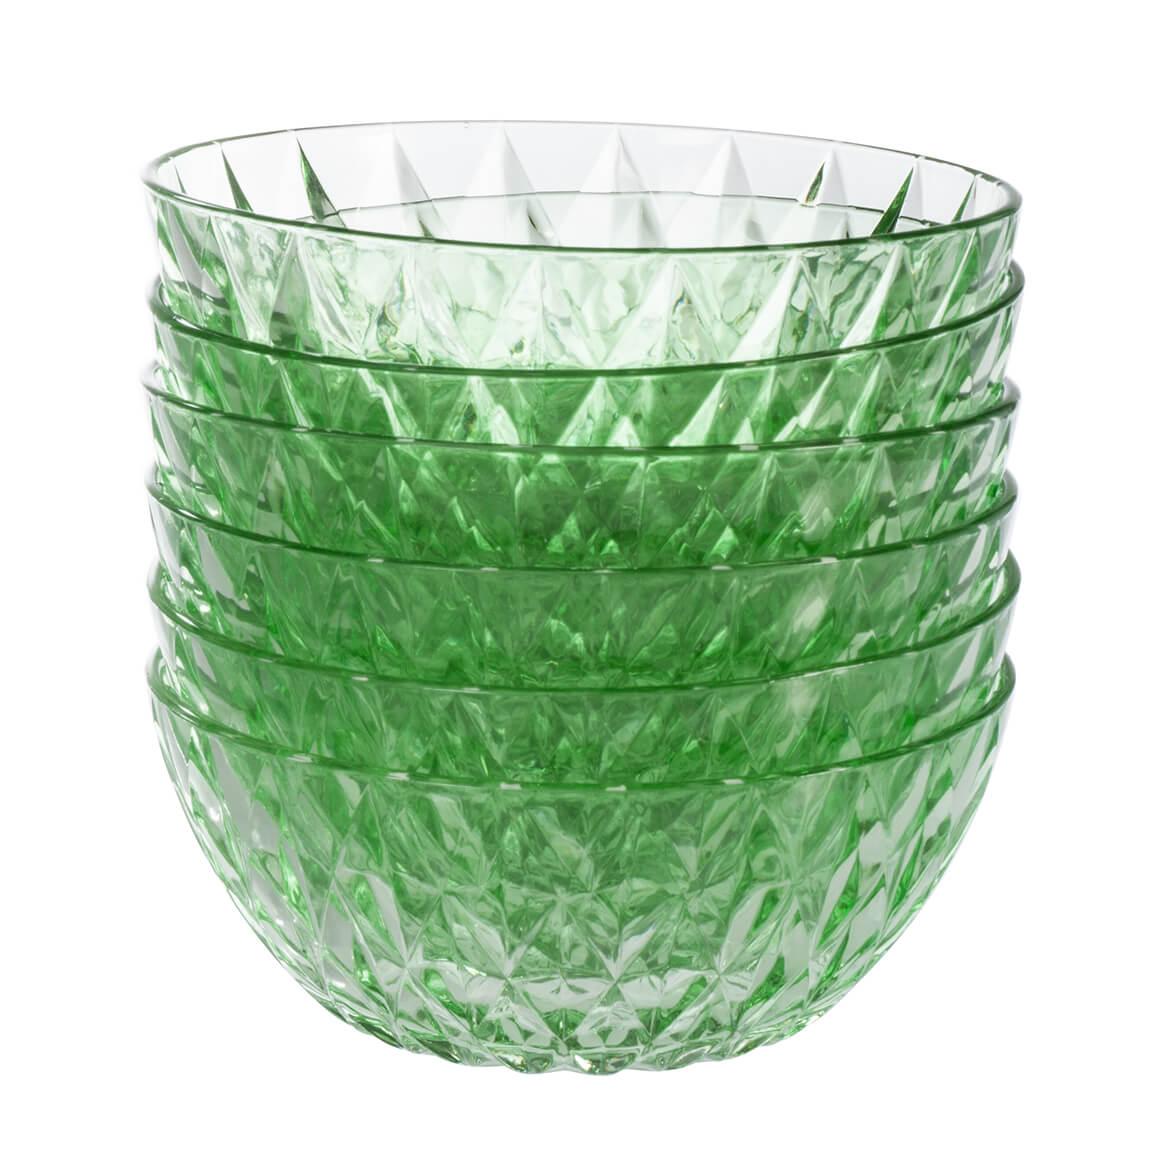 "William Roberts 6"" Glass Diamond Bowls, Set of 6-365848"